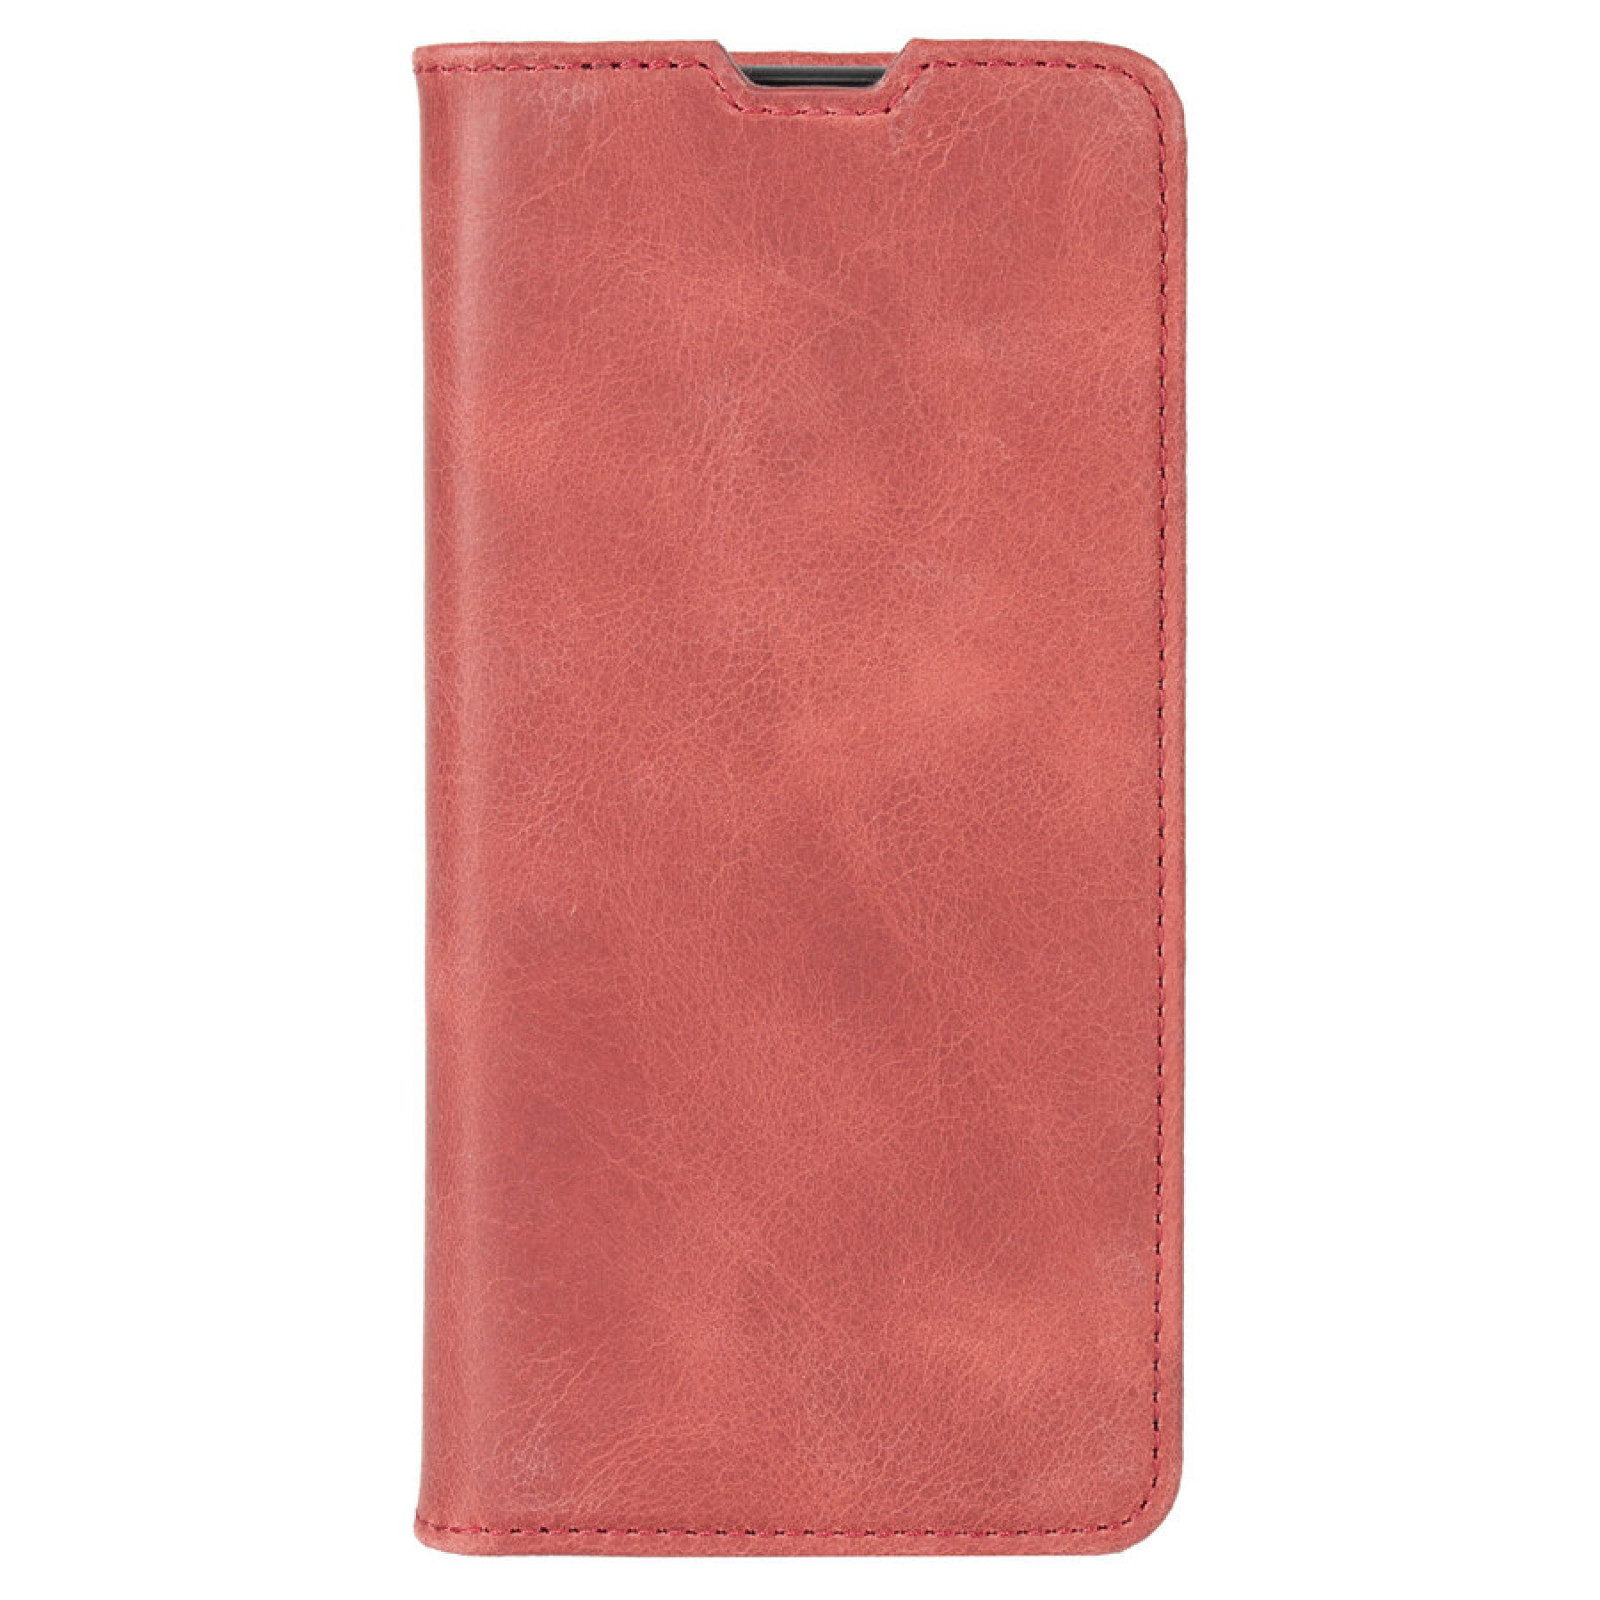 Калъф Krusell Sunne 2 Card Foliowallet естествена кожа за Samsung Galaxy S10 Vintage - Червен